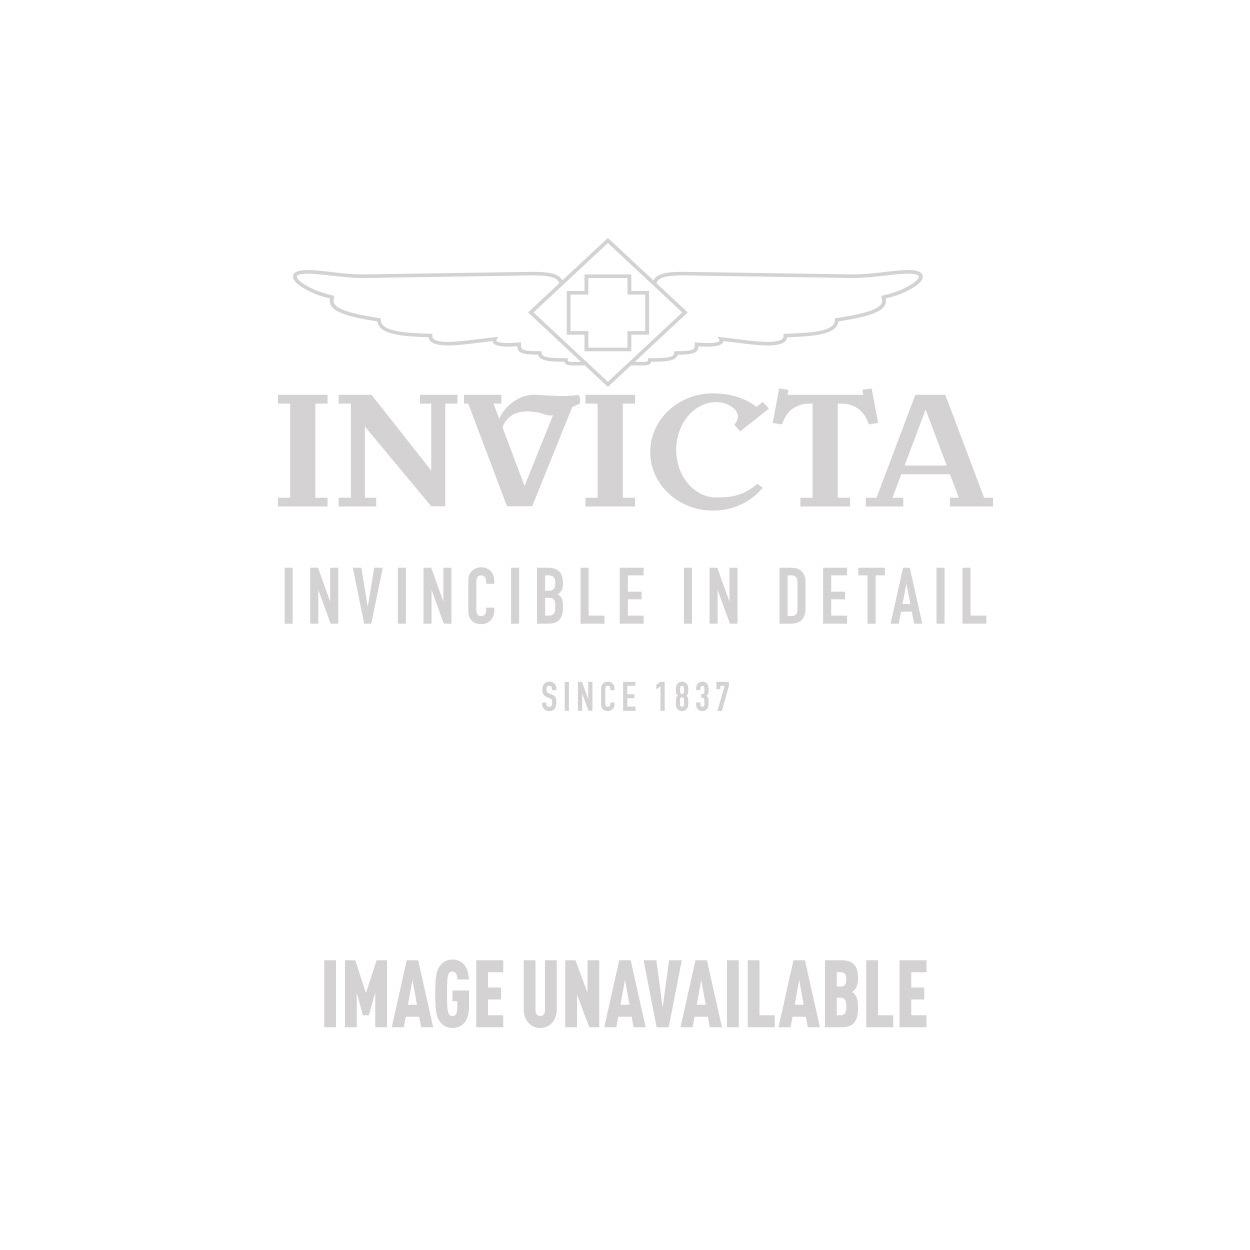 Invicta Sea Base  Quartz Watch - Gold, Black case with Gold, Black tone Titanium band - Model 14255